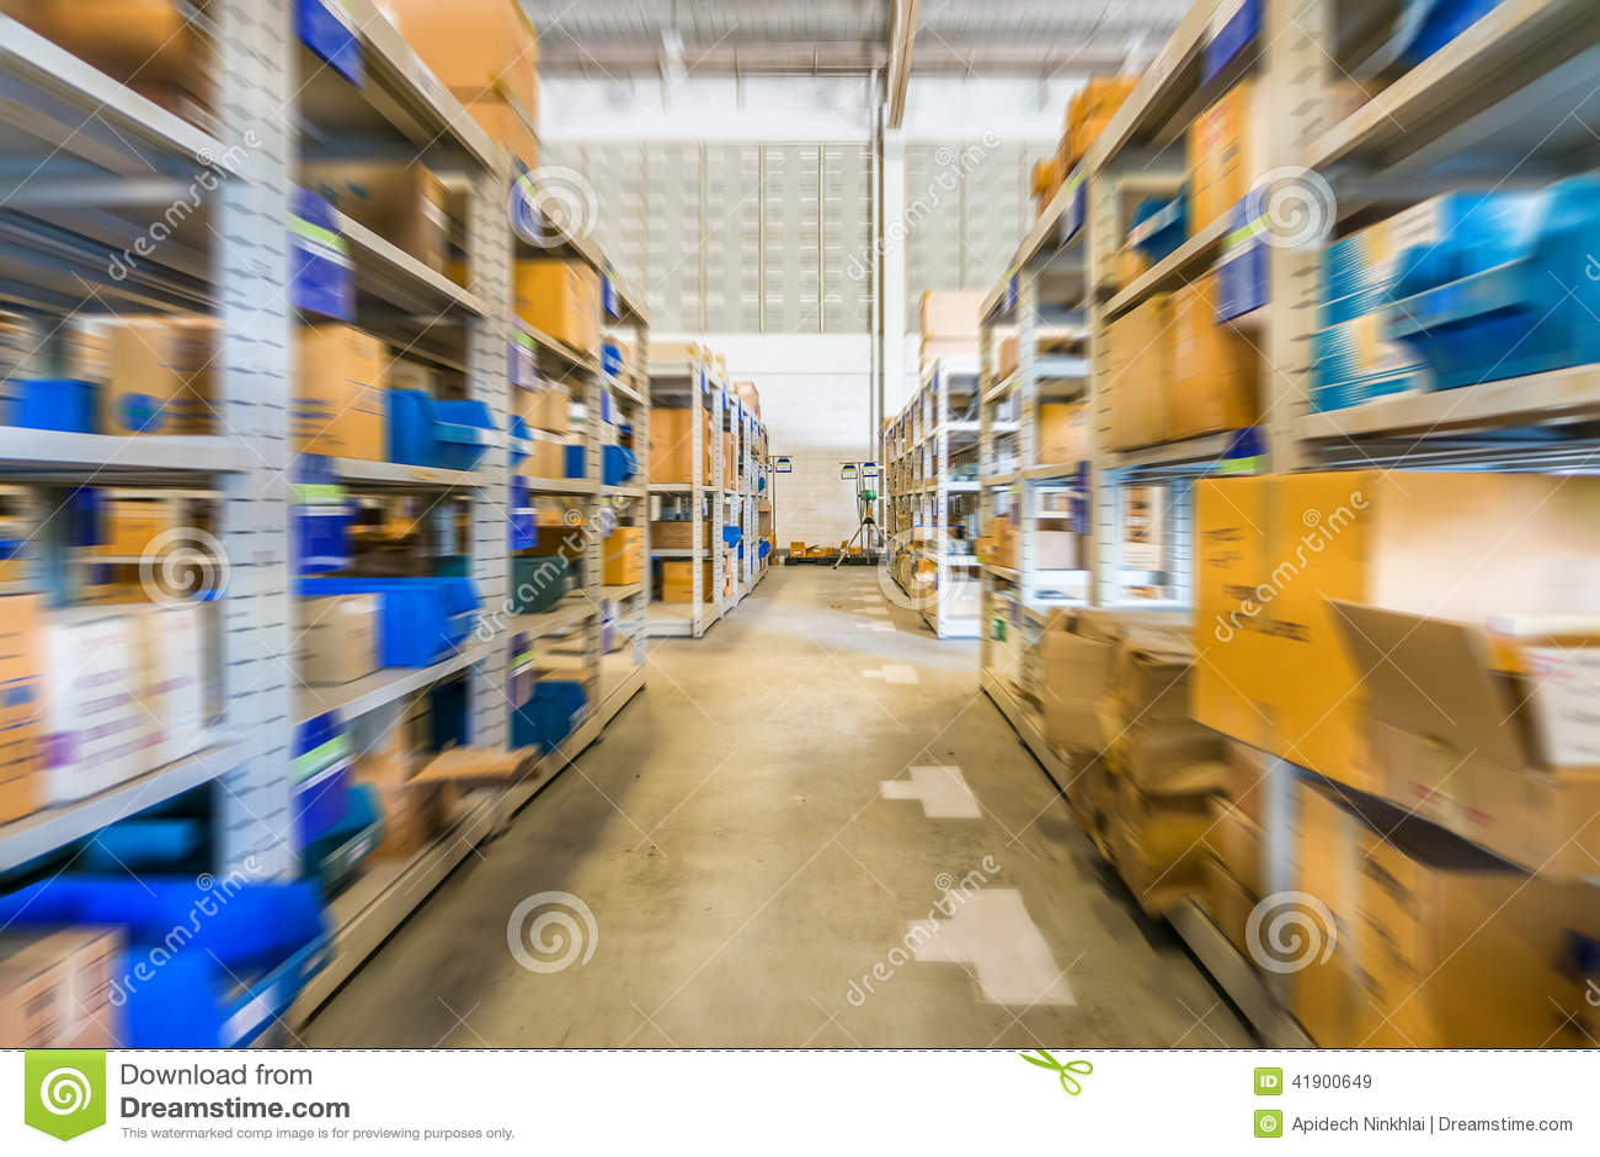 En almacén